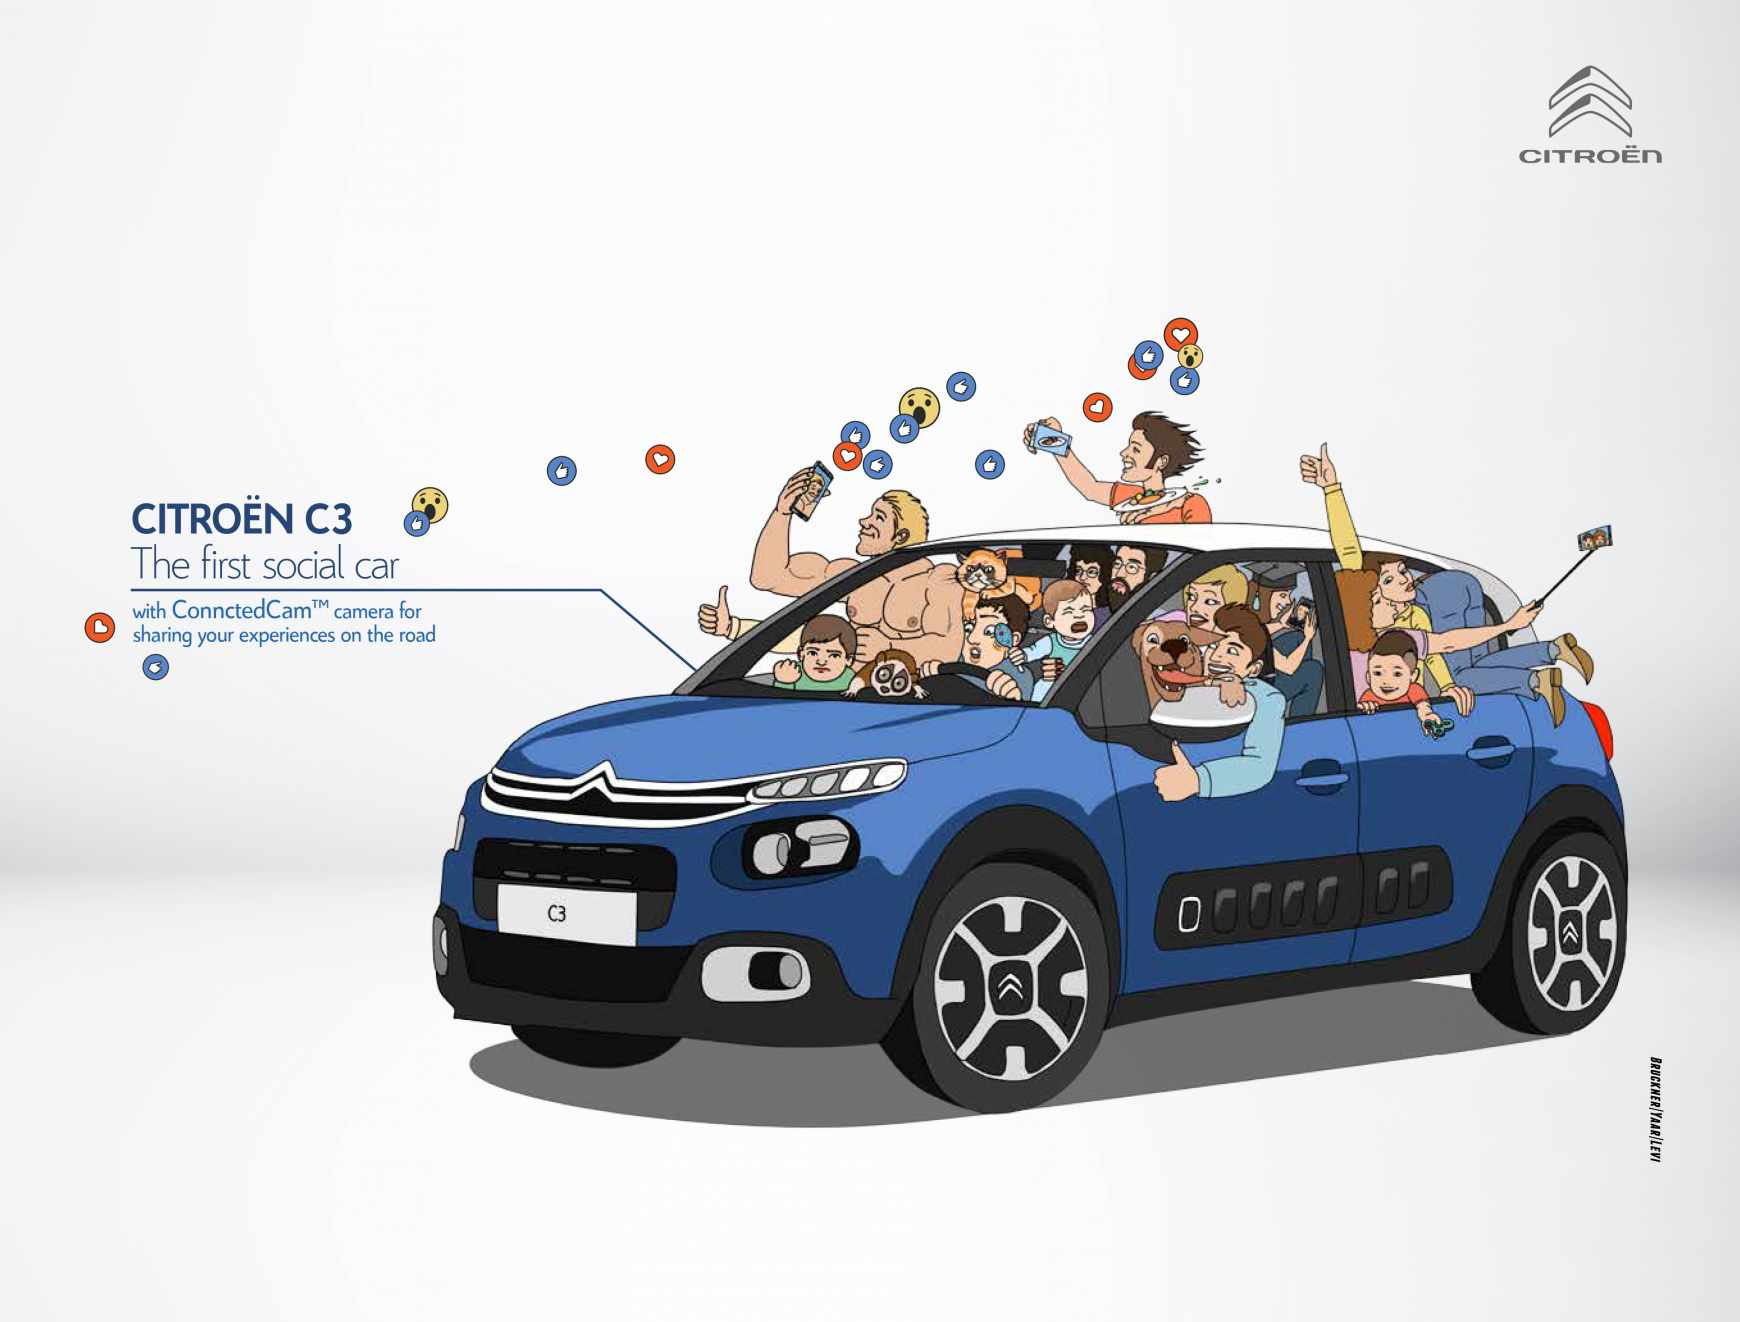 Citroën Print Ad - The First Social Car